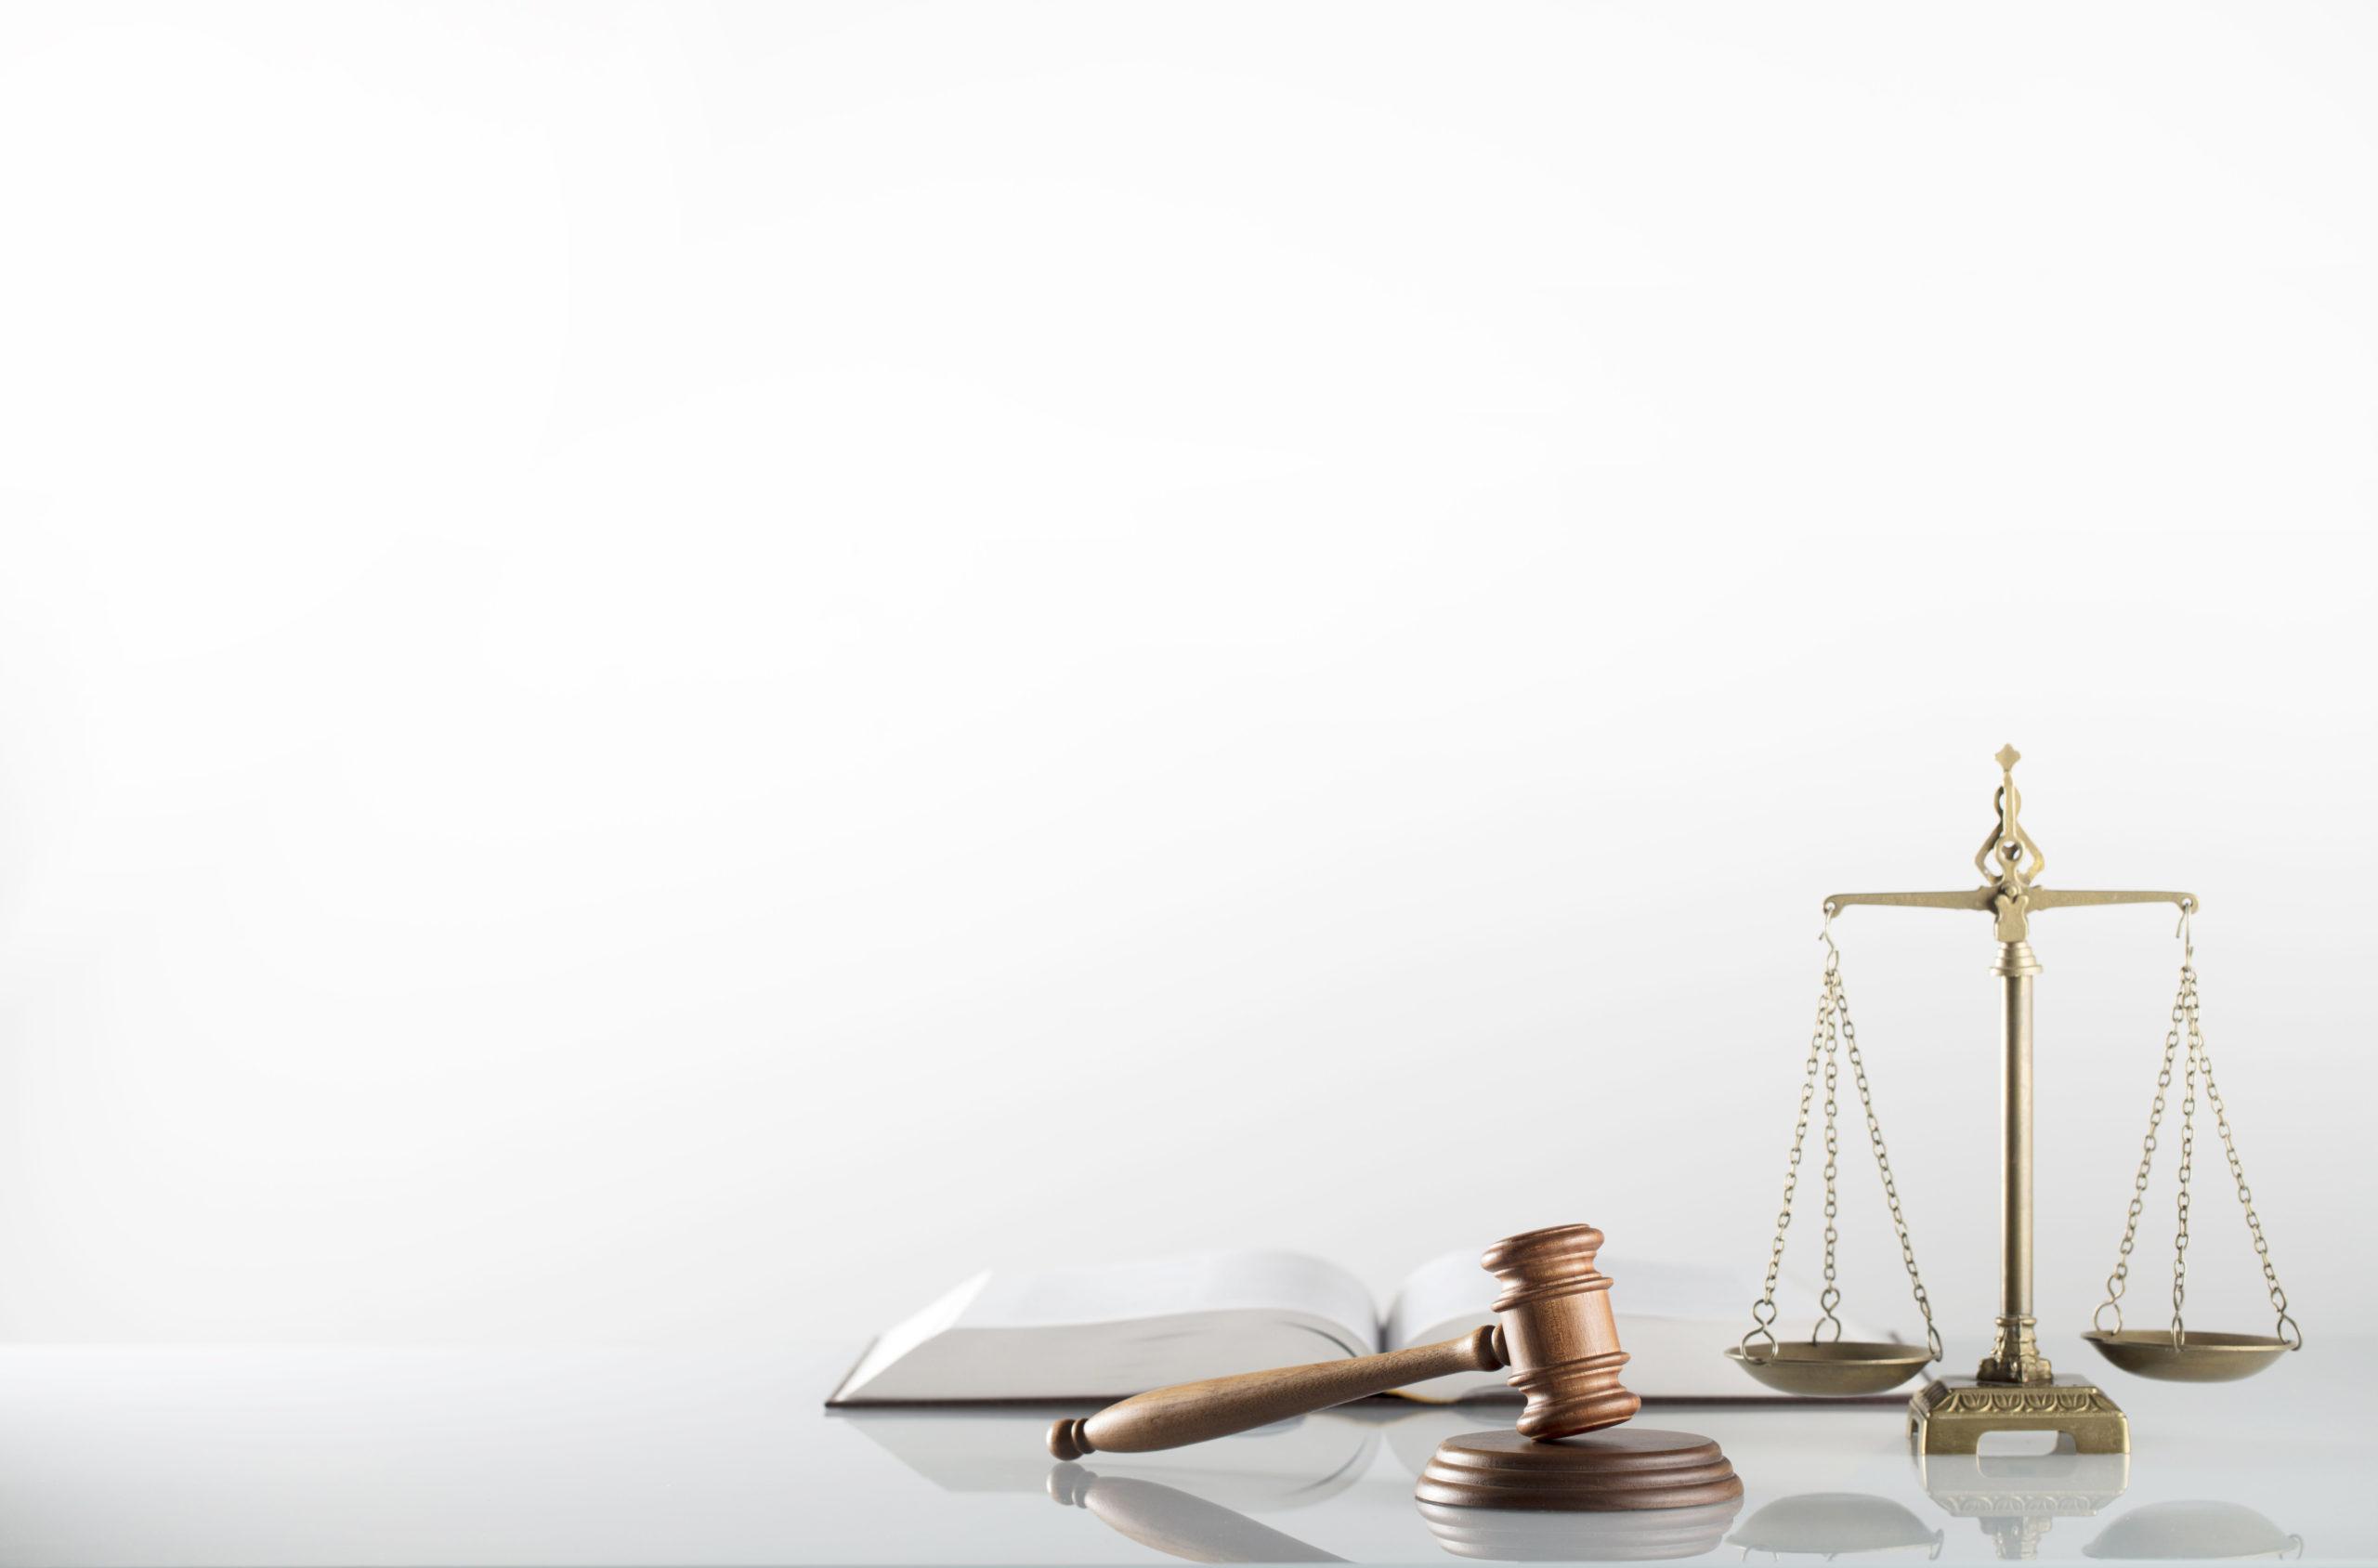 Law Symbols Isolated